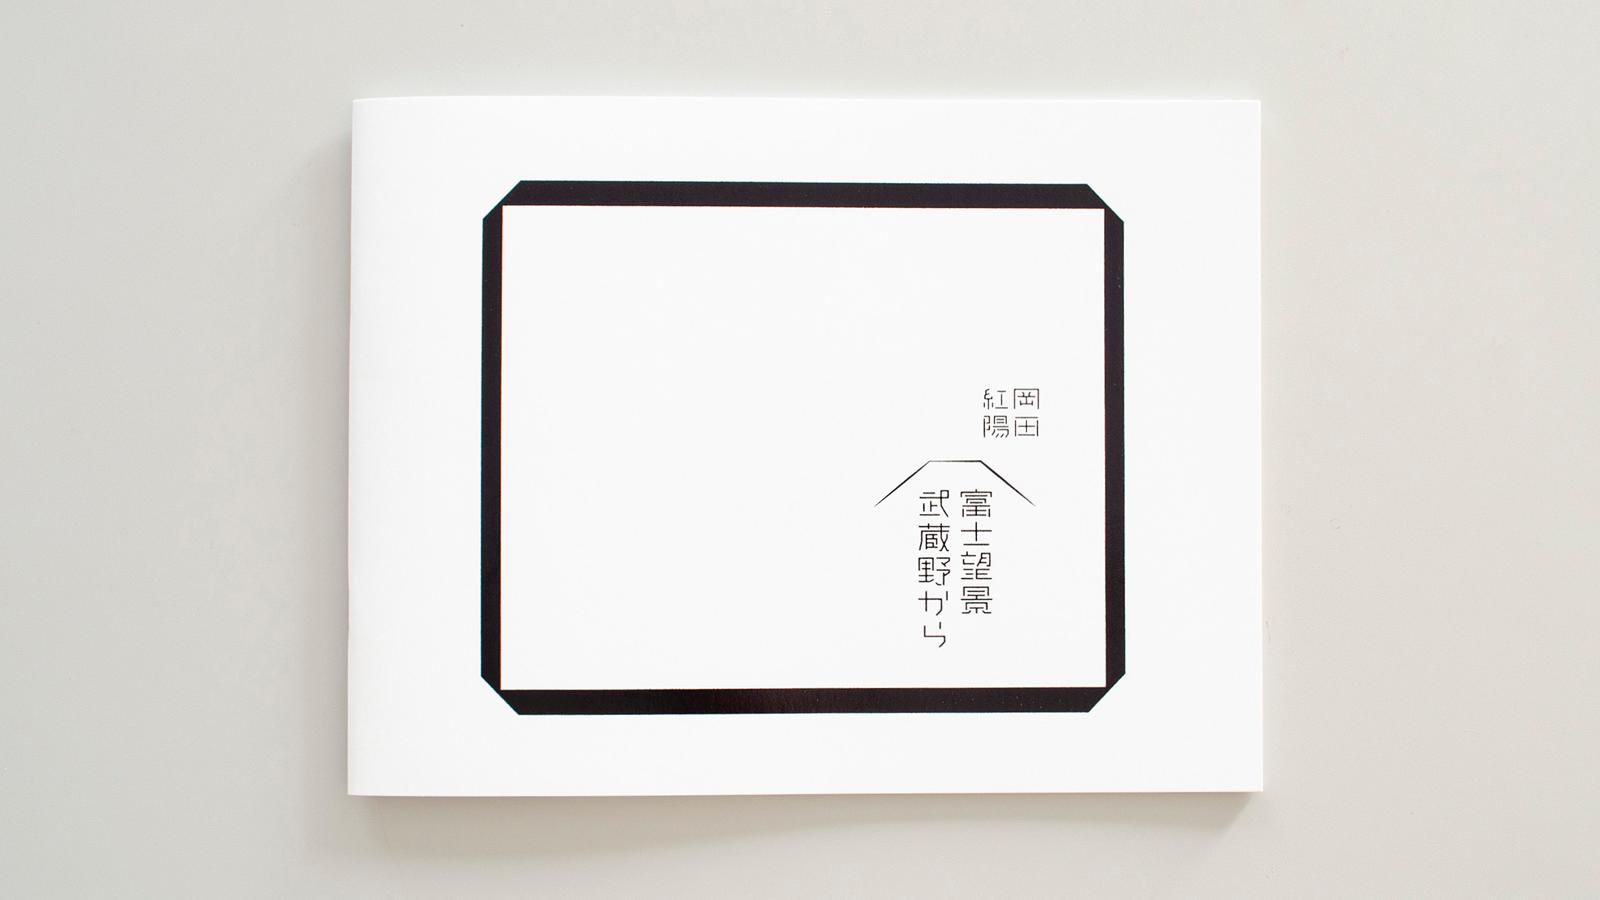 岡田紅陽 富士望景 武蔵野から|武蔵野市立吉祥寺美術館